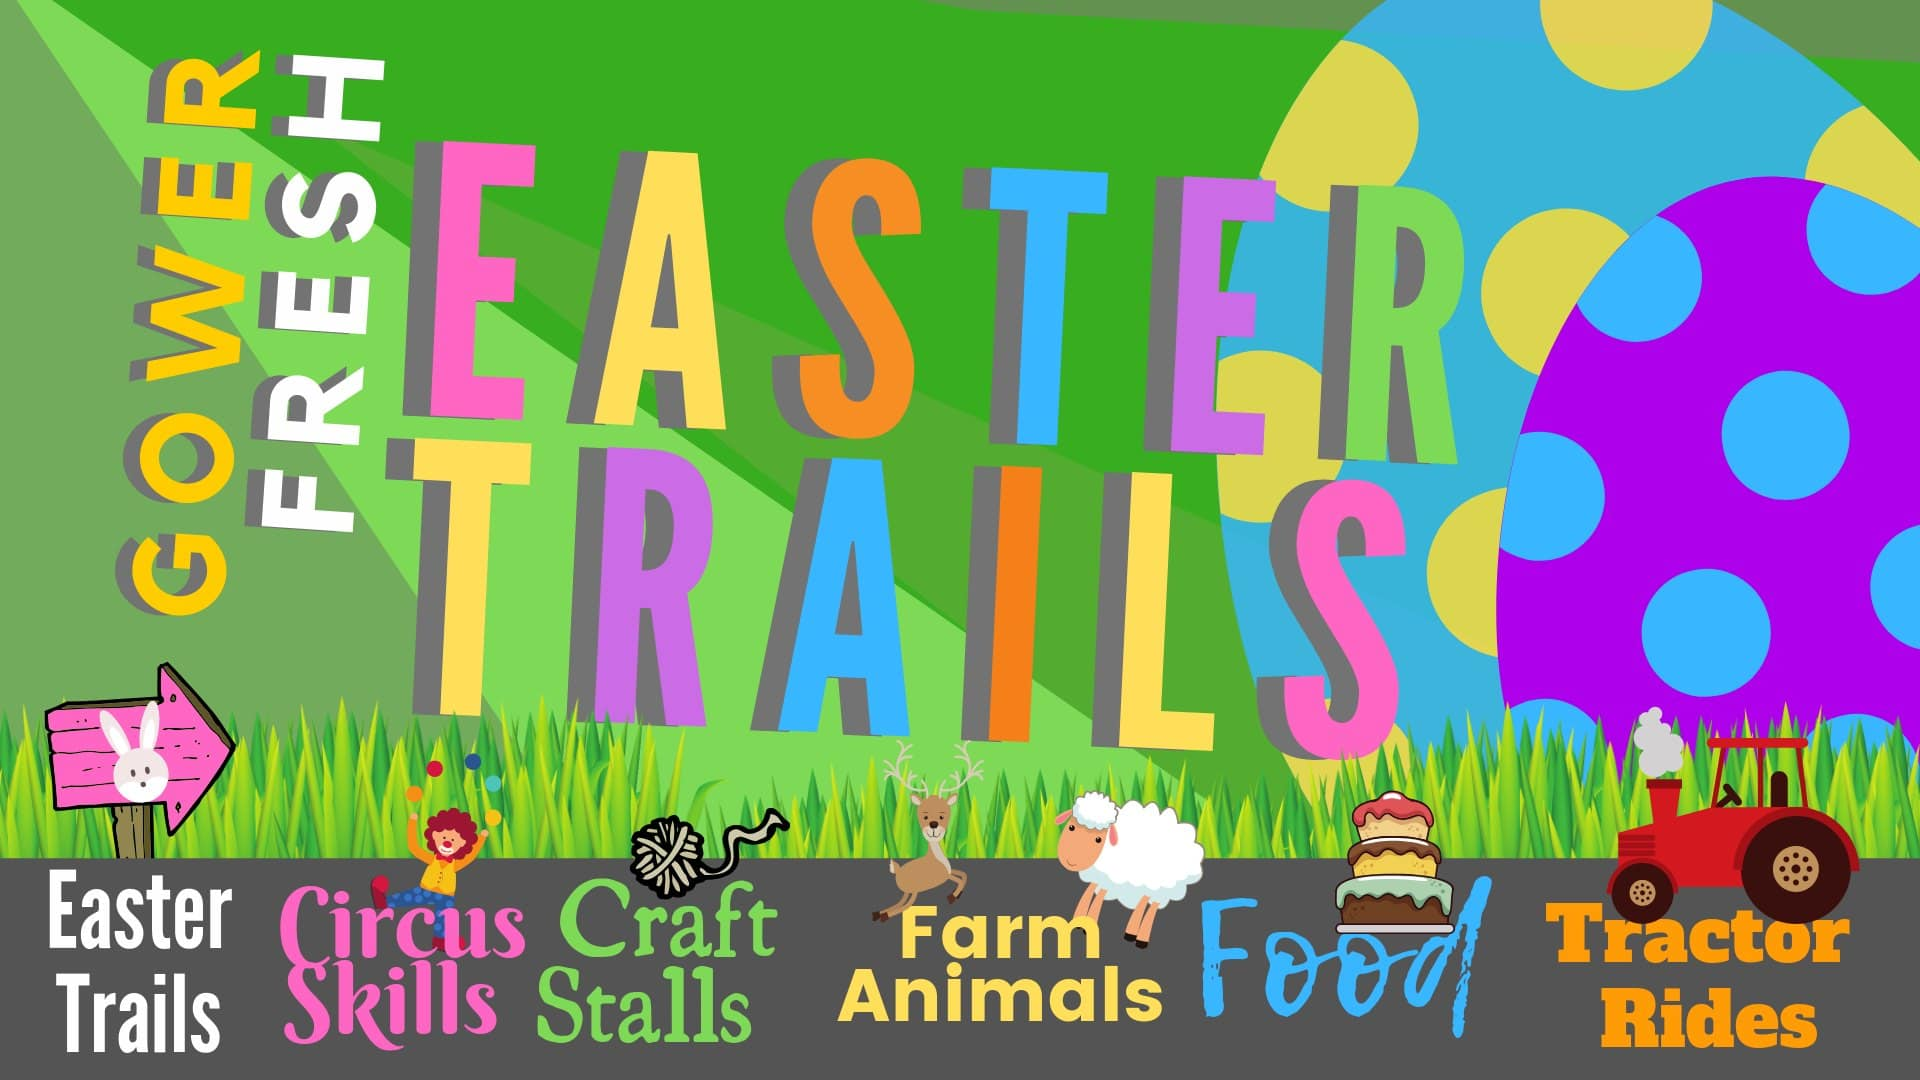 Gower Fresh Easter Trails